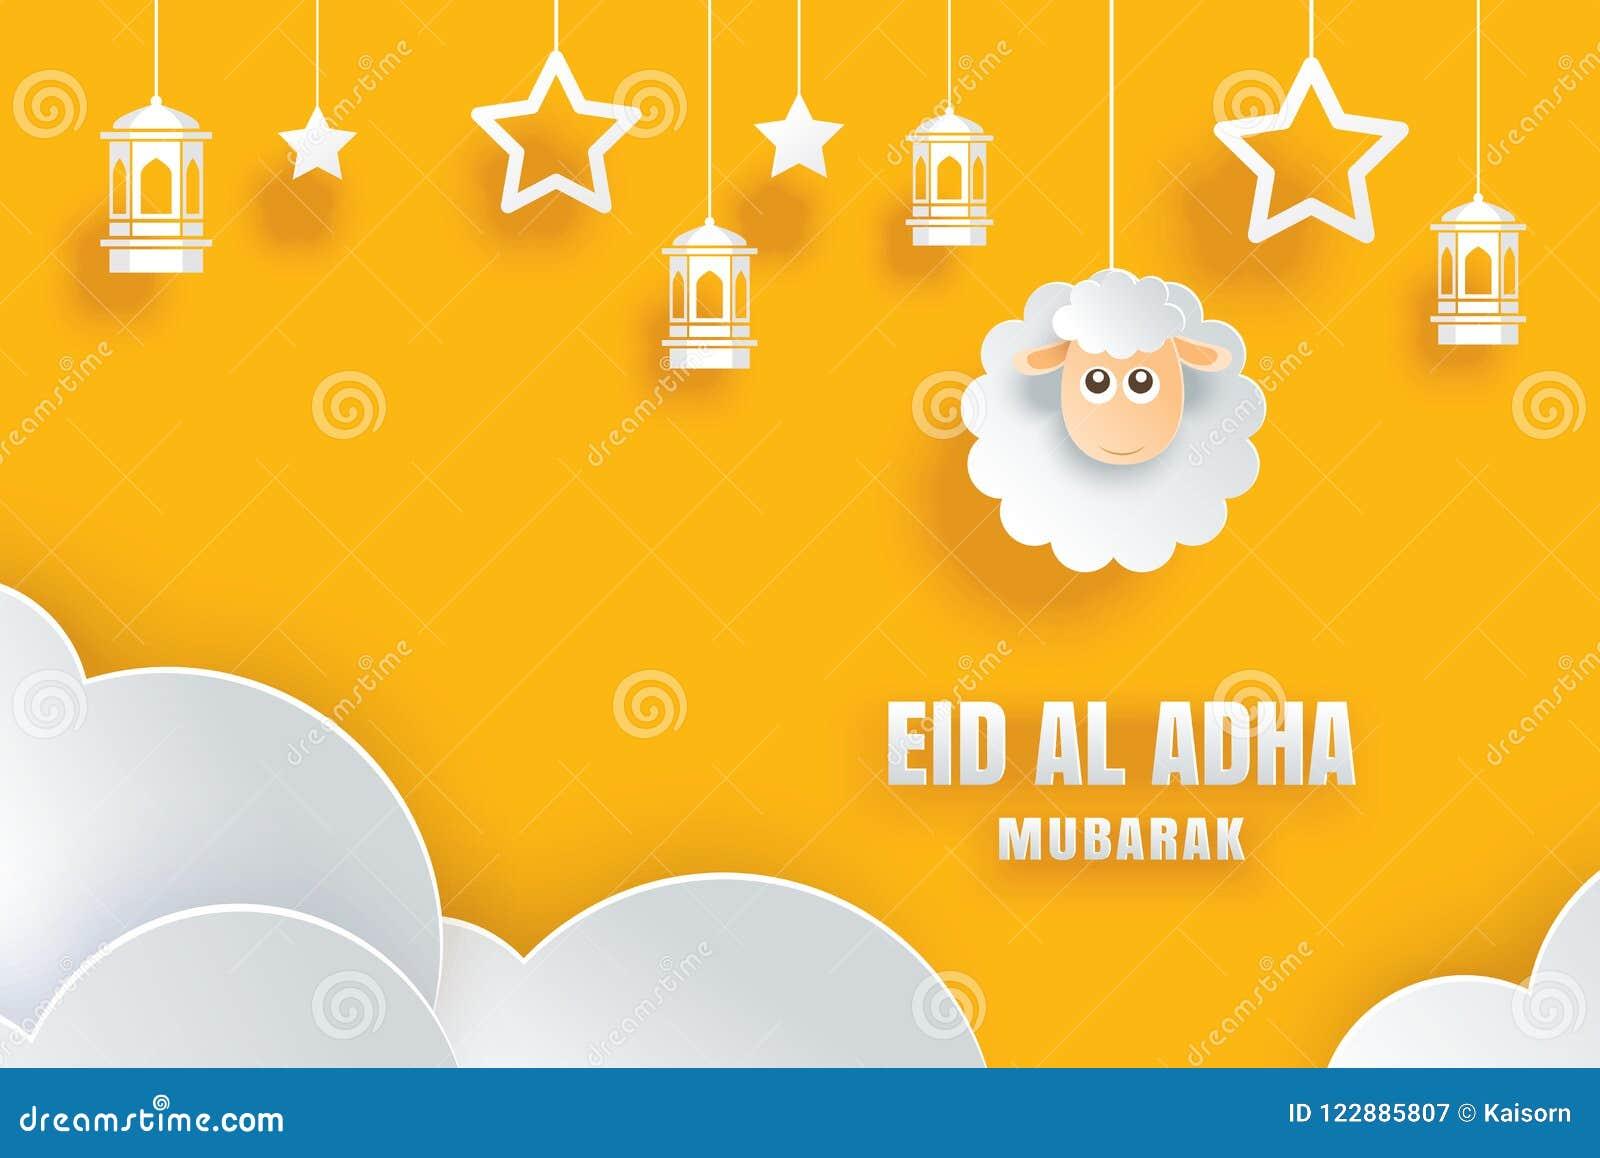 Eid Al Adha Mubarak Celebration Card With Sheep In Paper Art Yellow